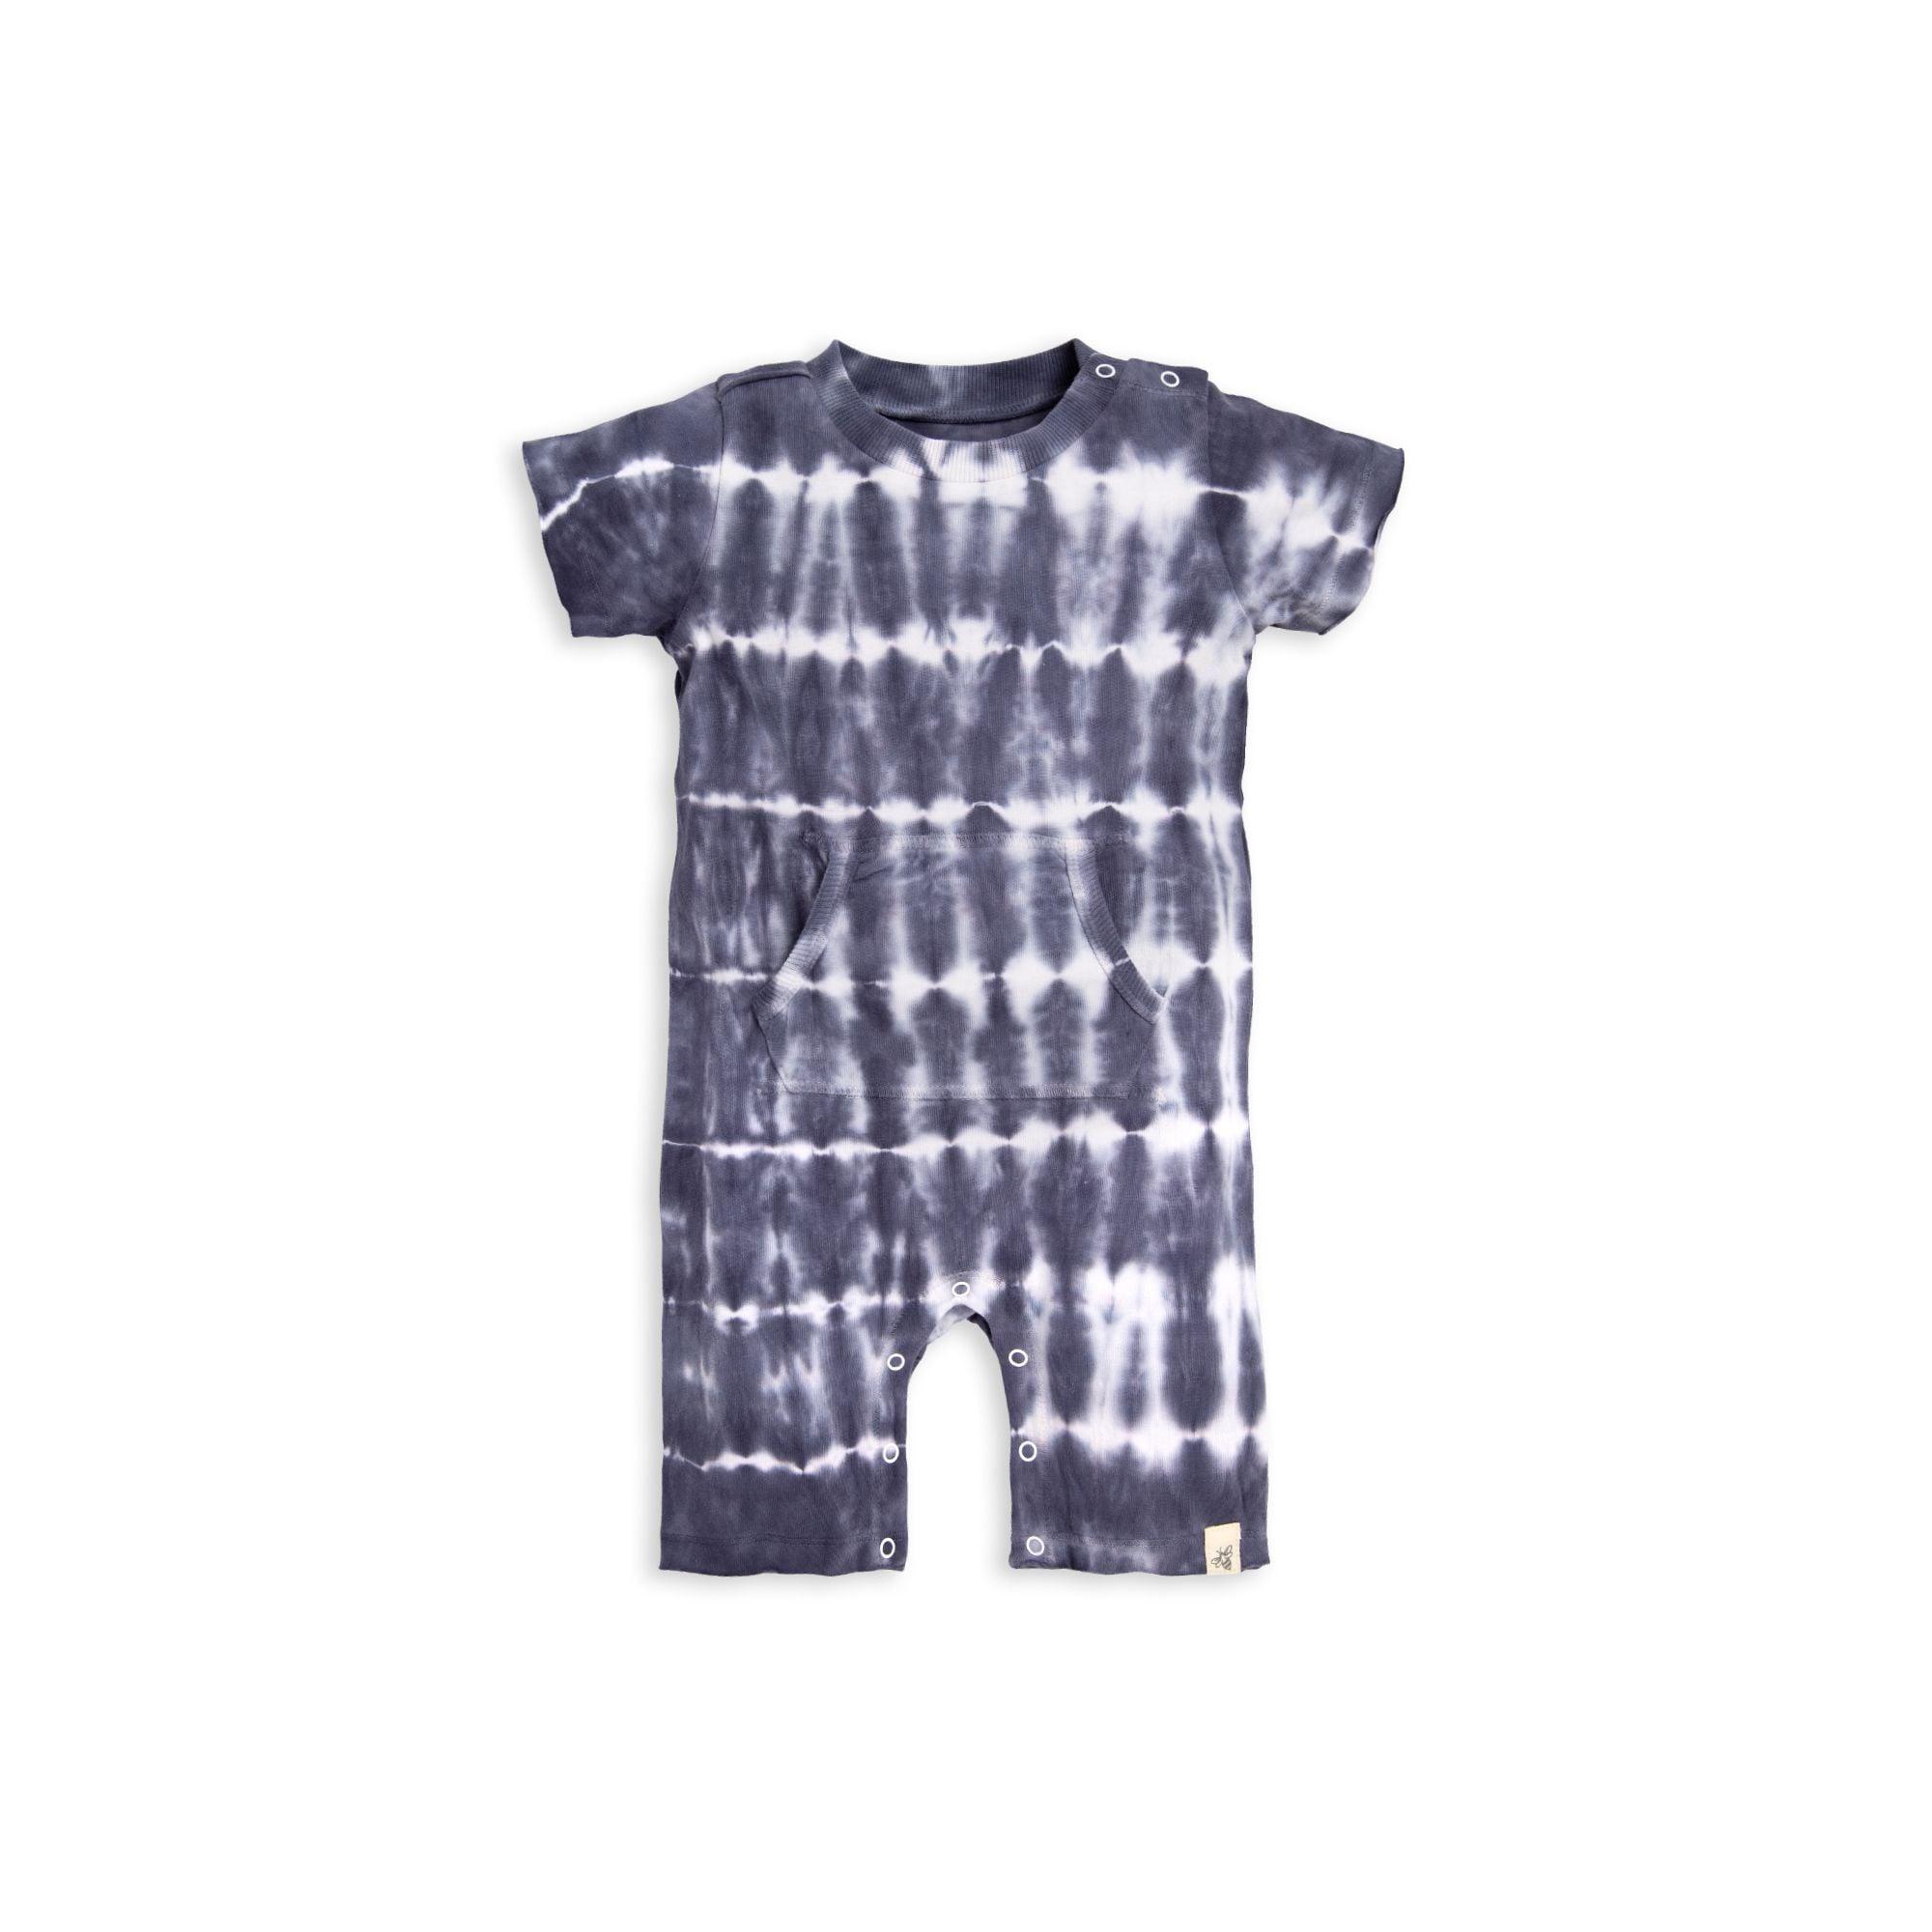 Tie-Dye Infant Onesie